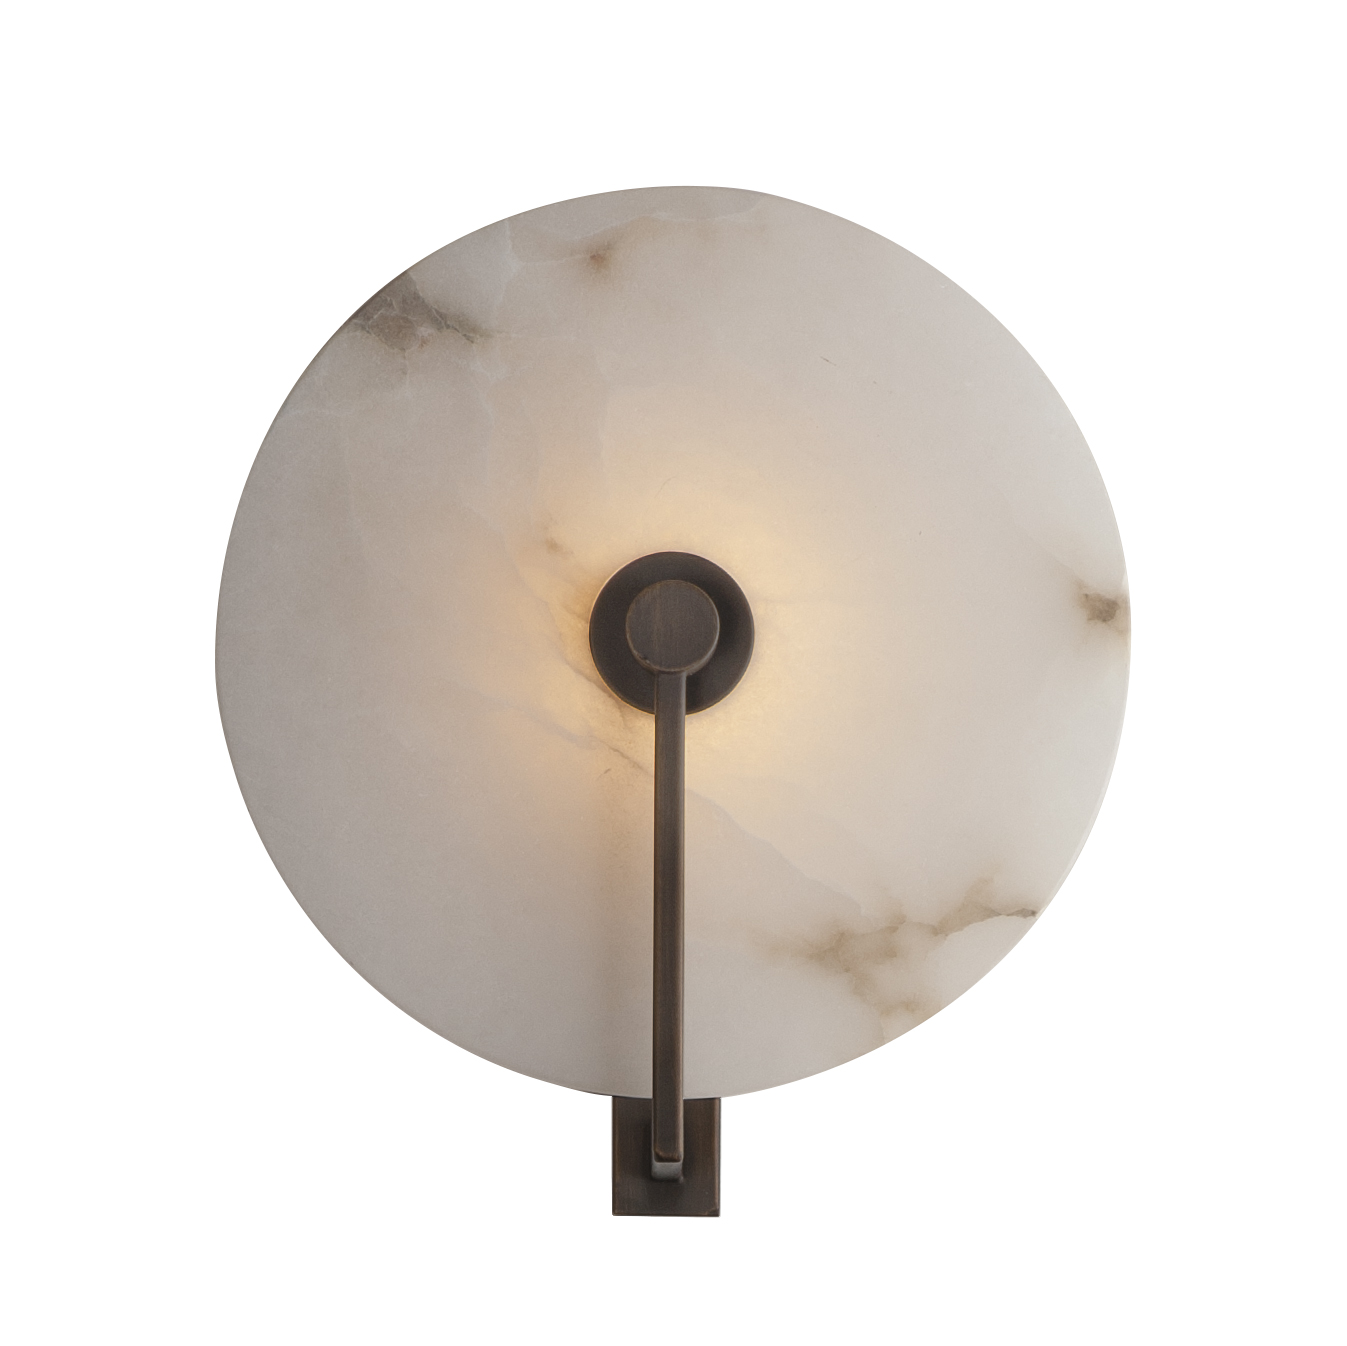 Quarry LED Wall Sconce | Maxim Lighting